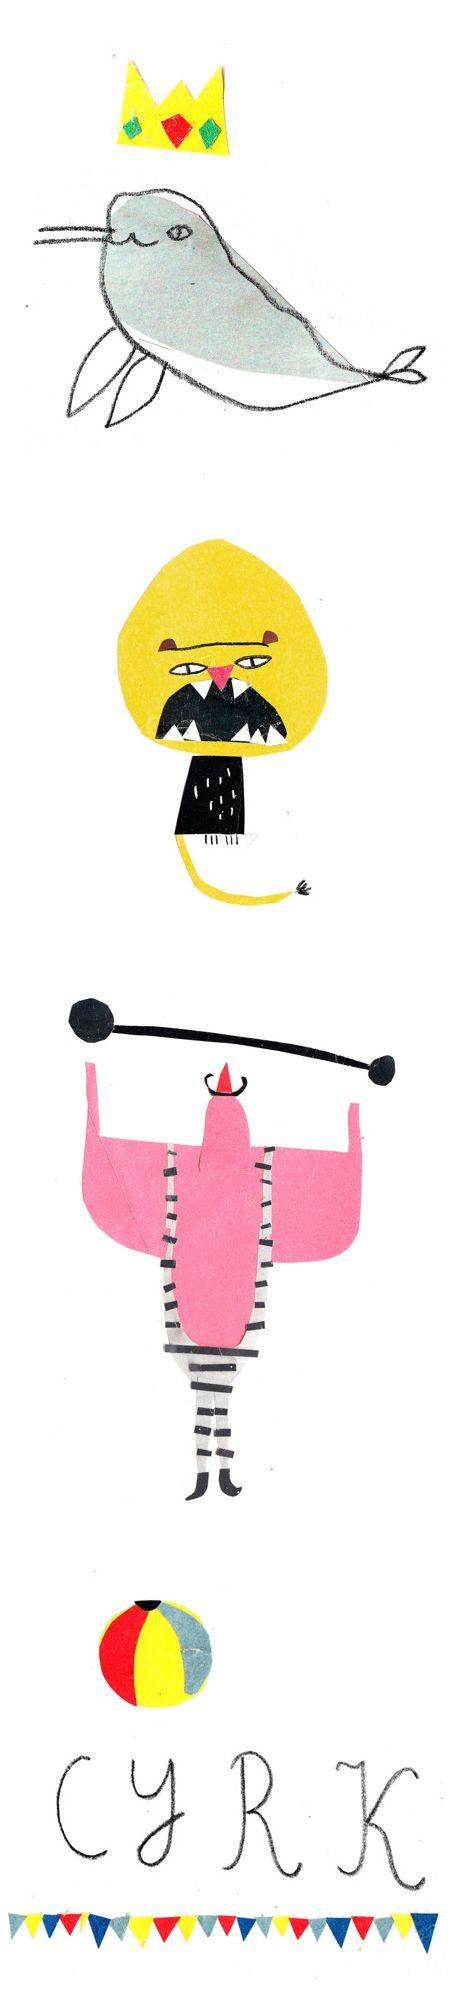 artist/illustrator agata krolak (the circus!)